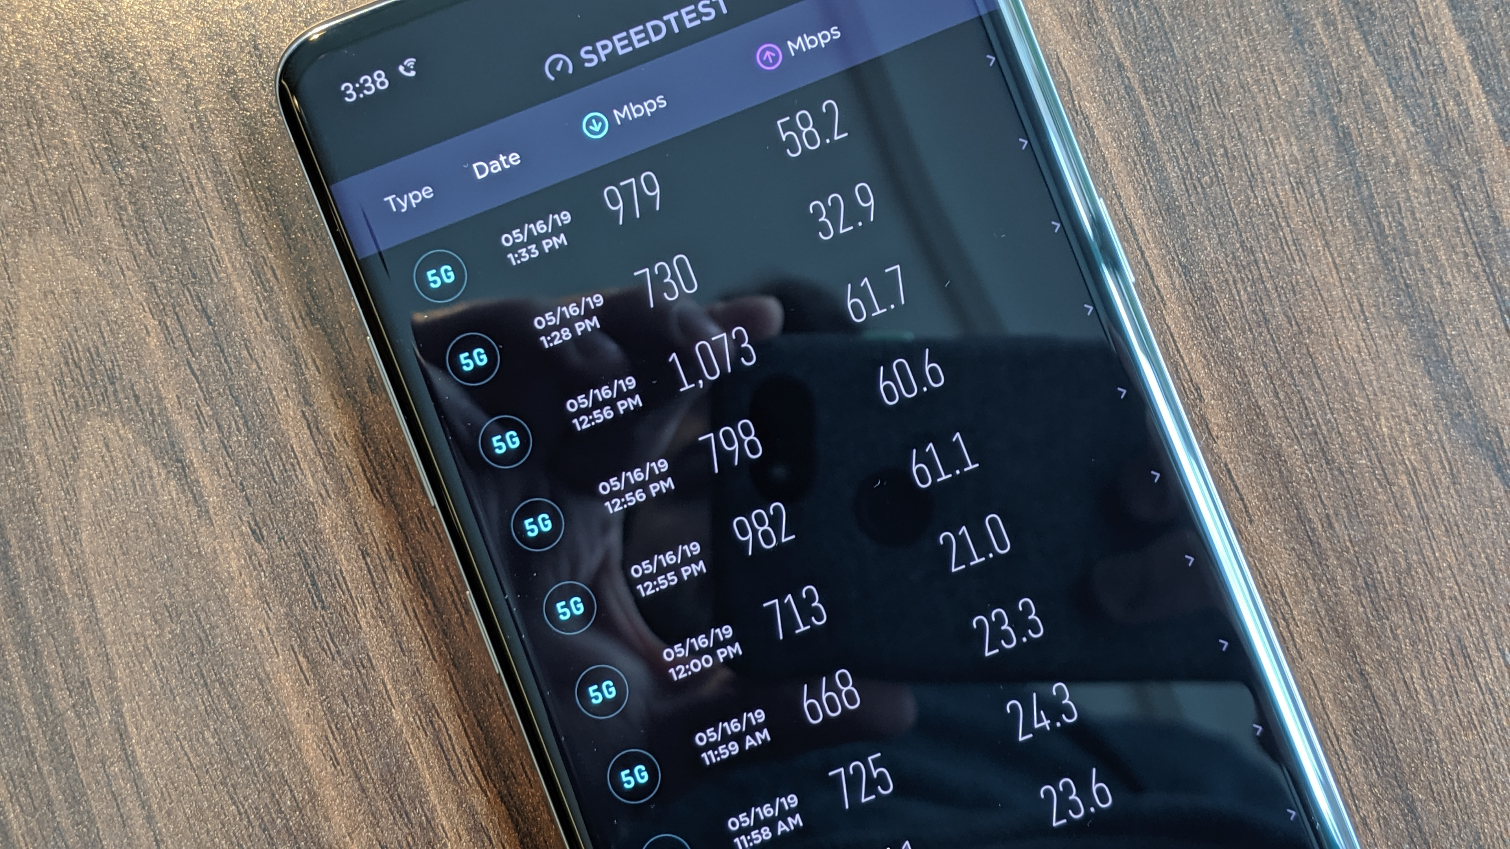 Galaxy S10 5G Tested: Crazy 1 Gbps Speeds on Verizon's